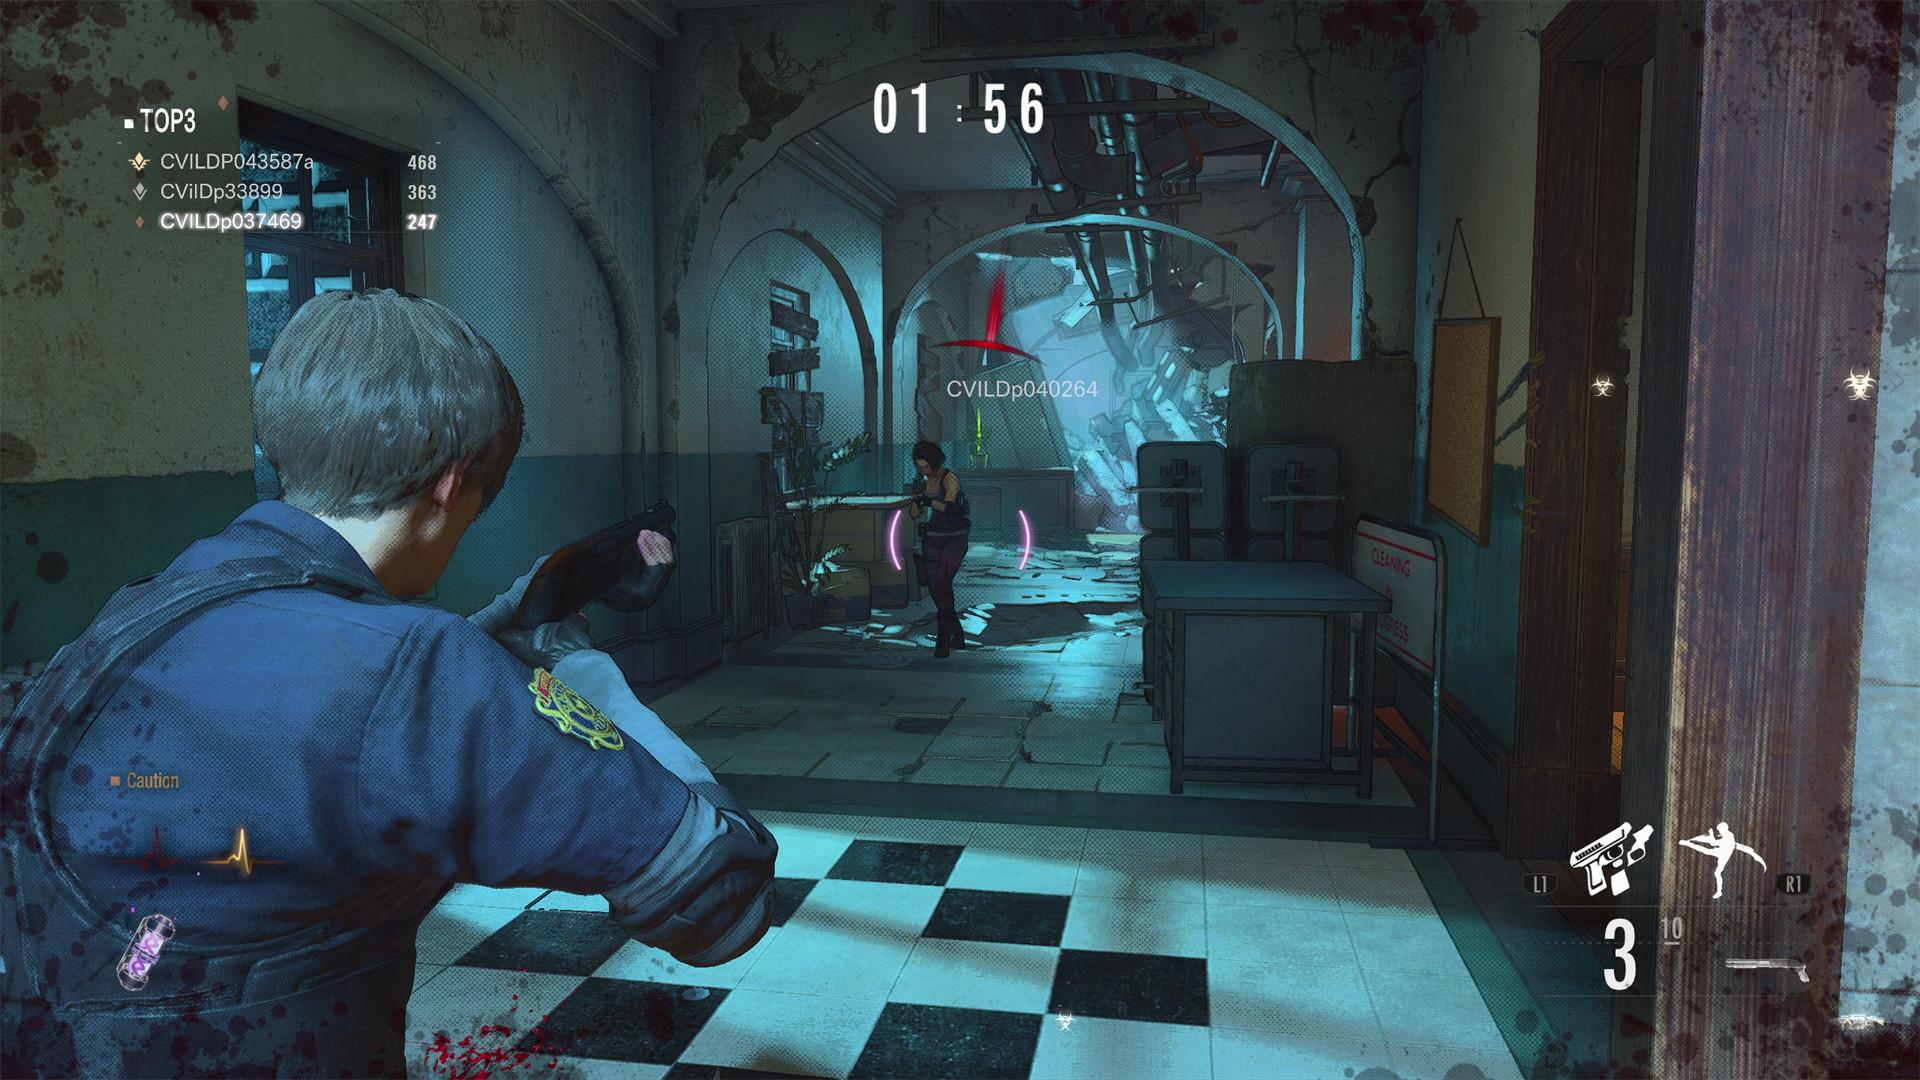 Resident Evil Re:Verse เตรียมเปิดให้ทดลองเล่นอีกครั้ง 13.00 วันนี้ โดยจะเล่นได้ถึง 13.00 พรุ่งนี้